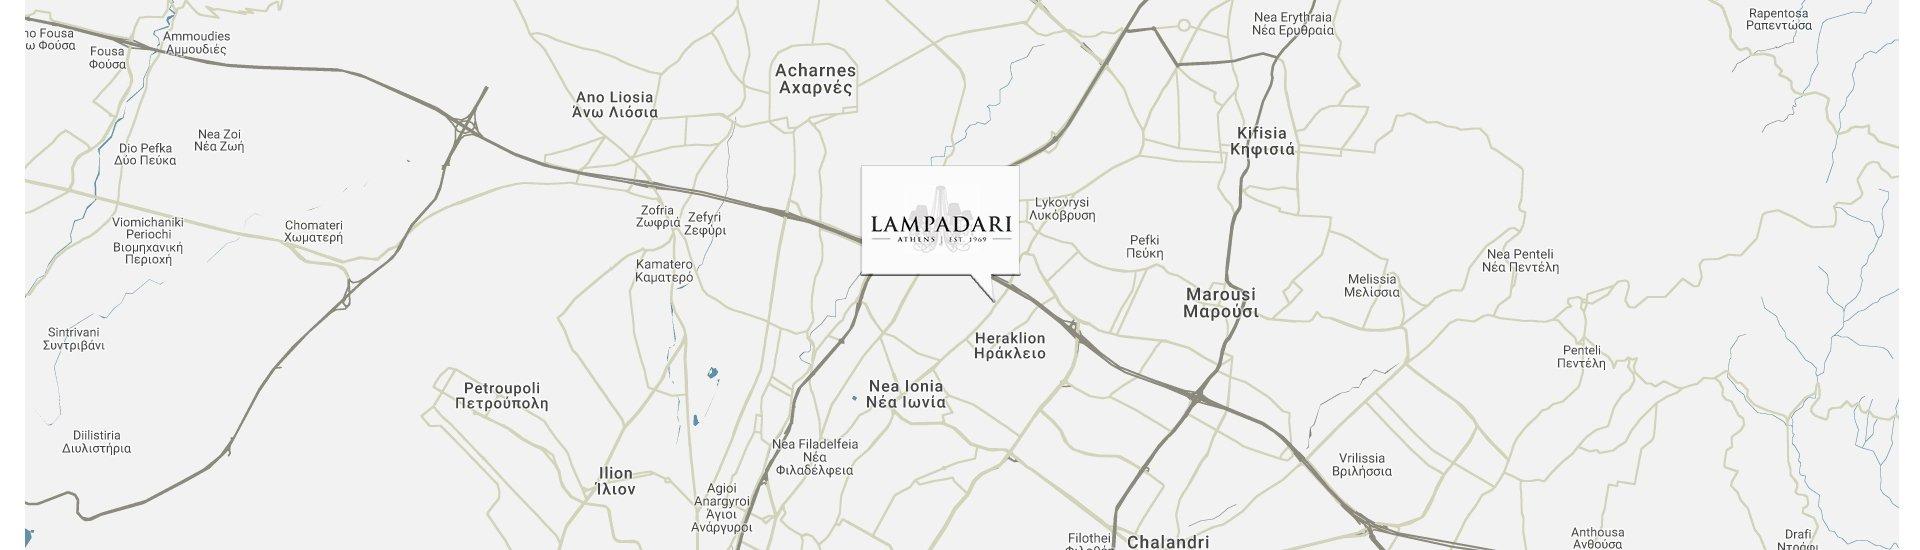 Lampadari Τοποθεσία Map Location